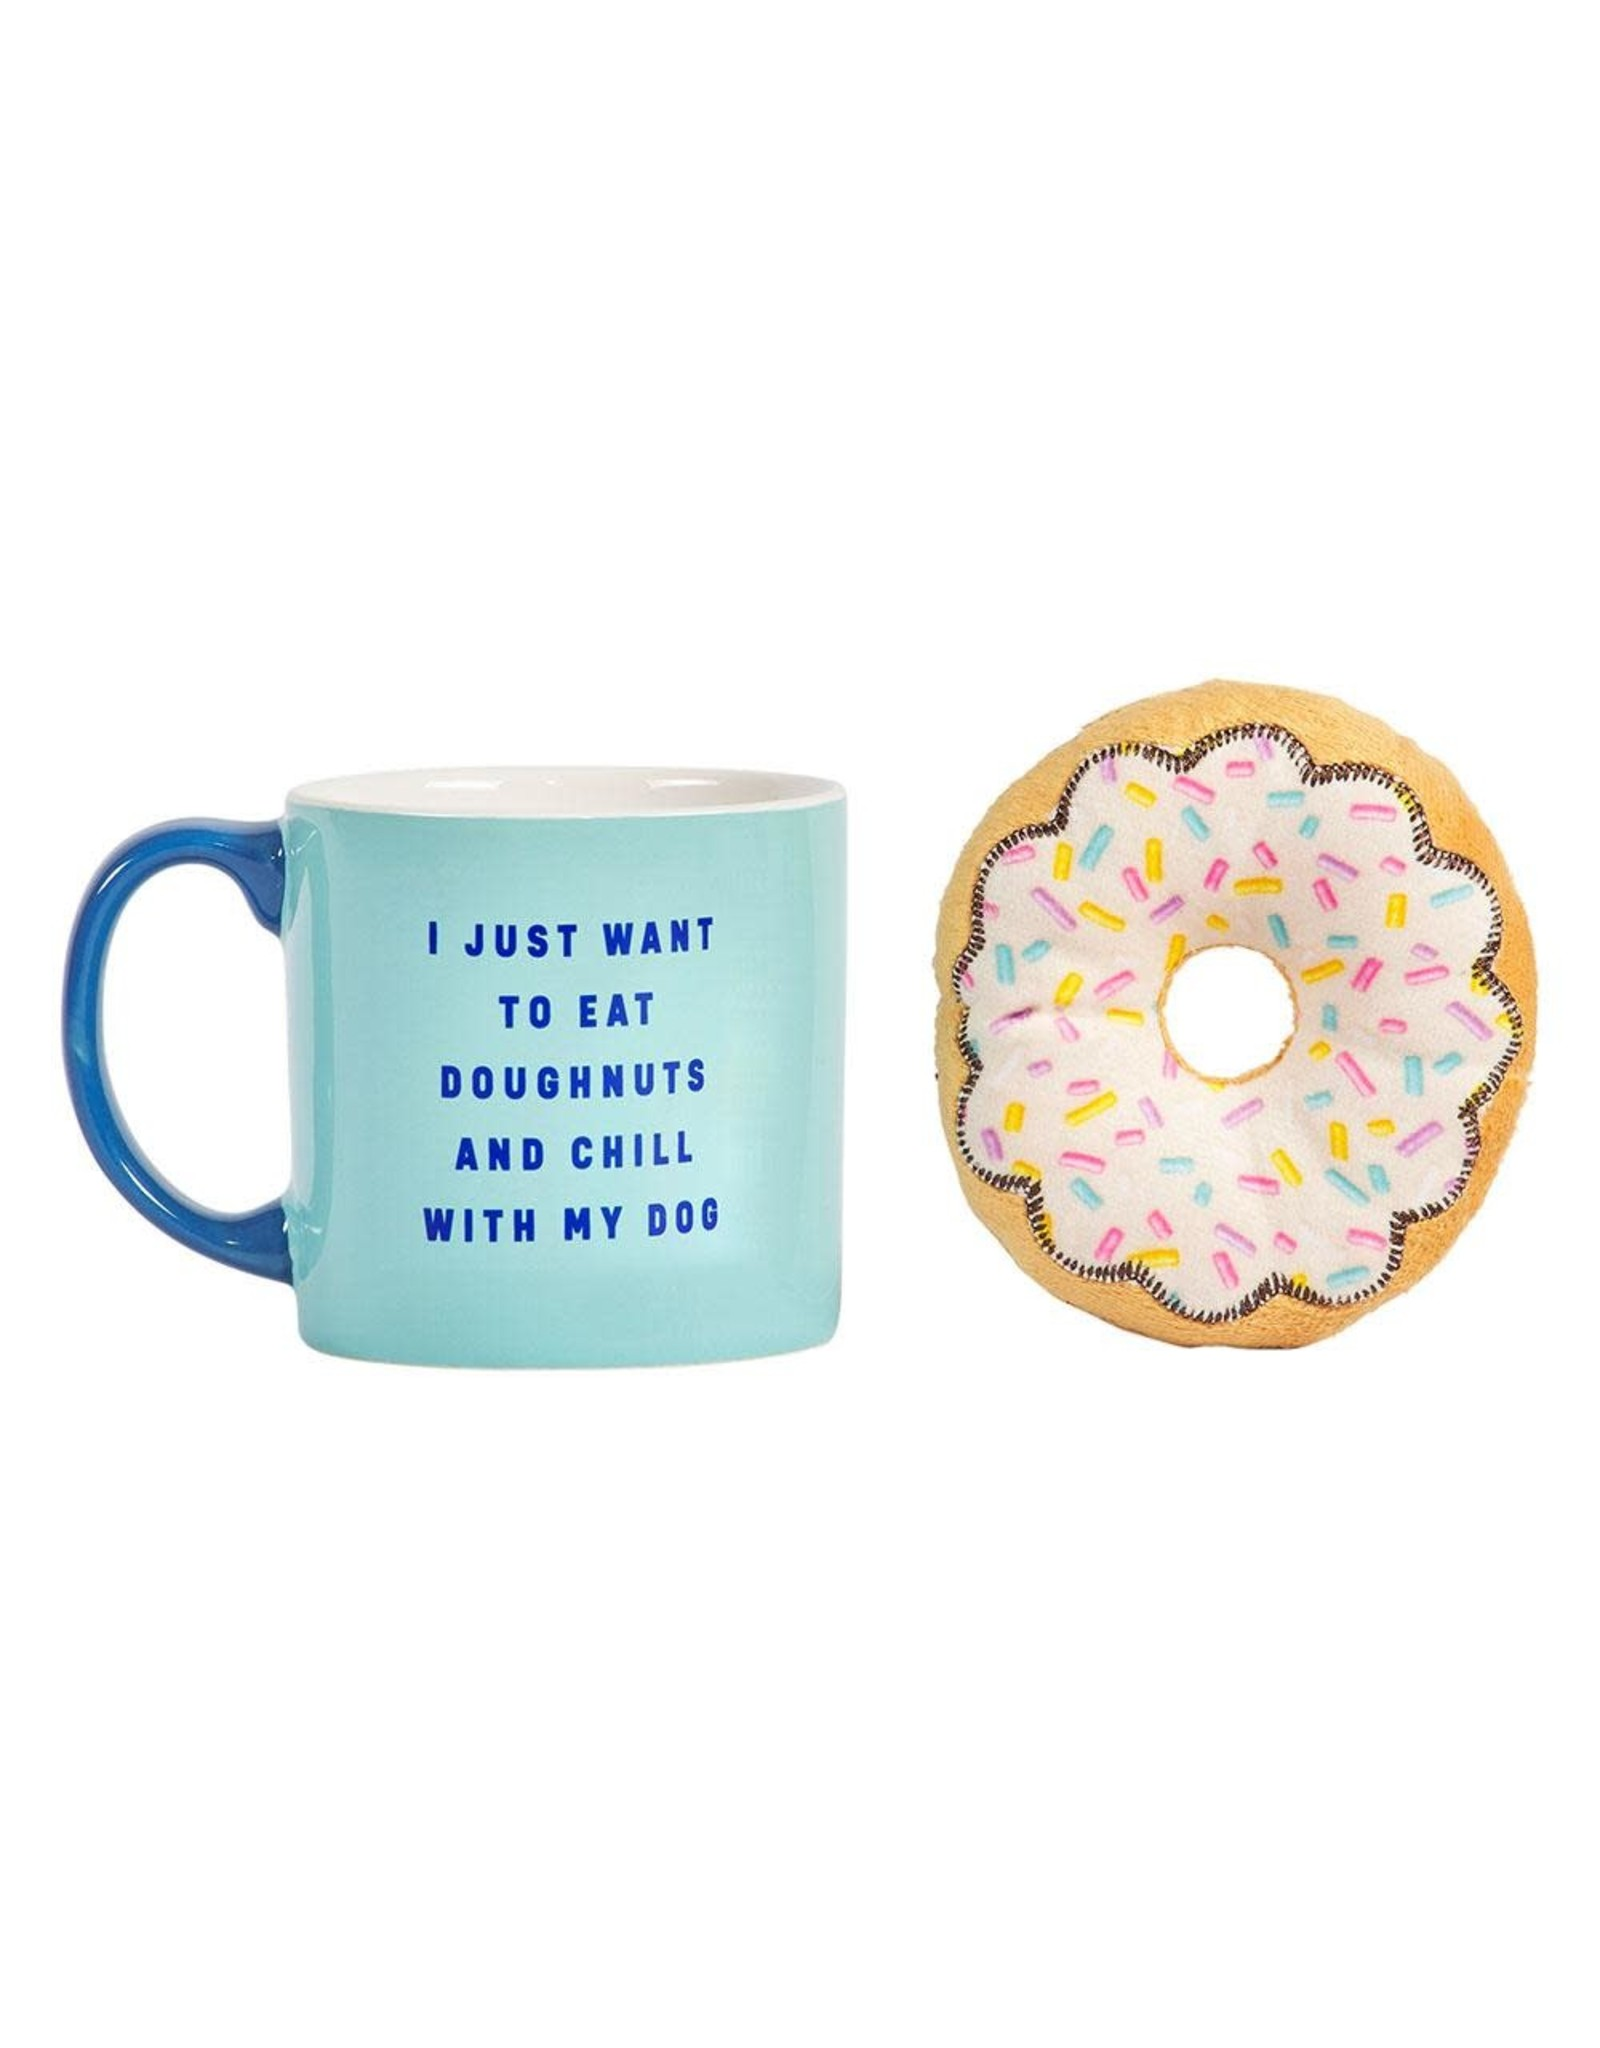 Mug and Doughnut Dog Toy